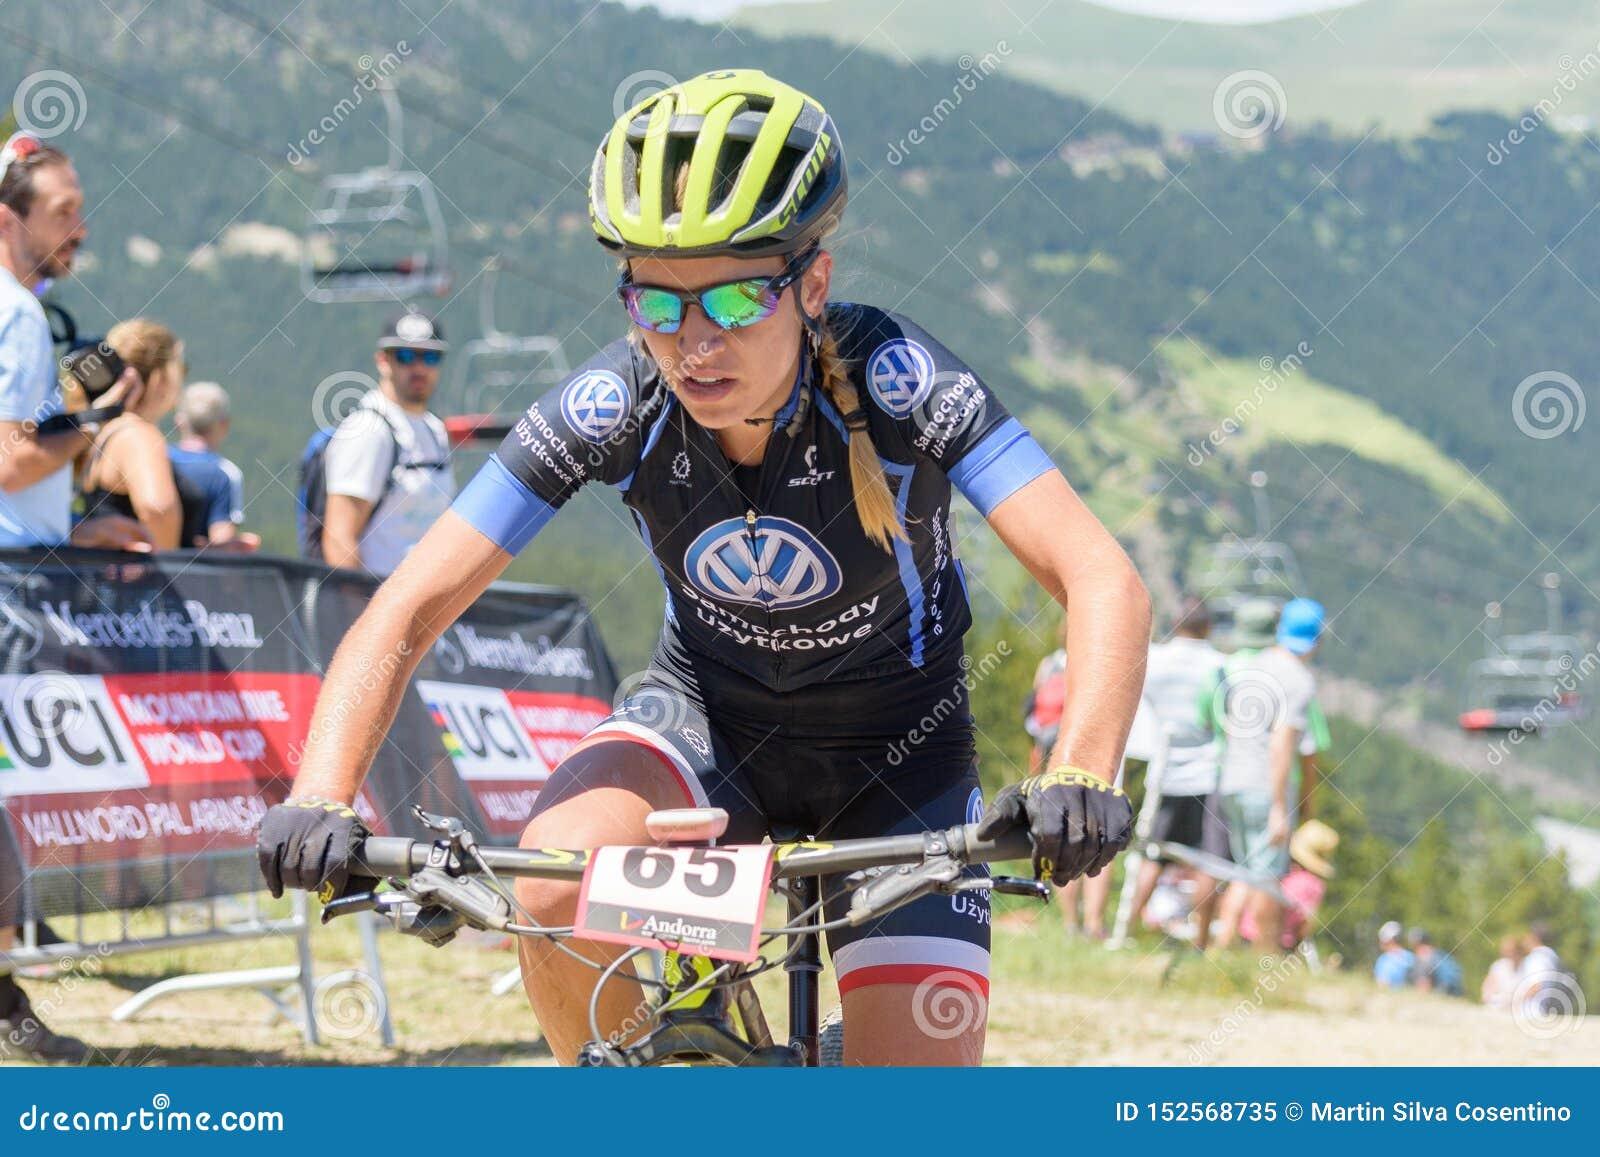 CICLISTAS no CAMPEONATO DO MUNDO 2019 de MERCEDES-BENZ UCI MTB - XCO Vallnord, Andorra em julho de 2019